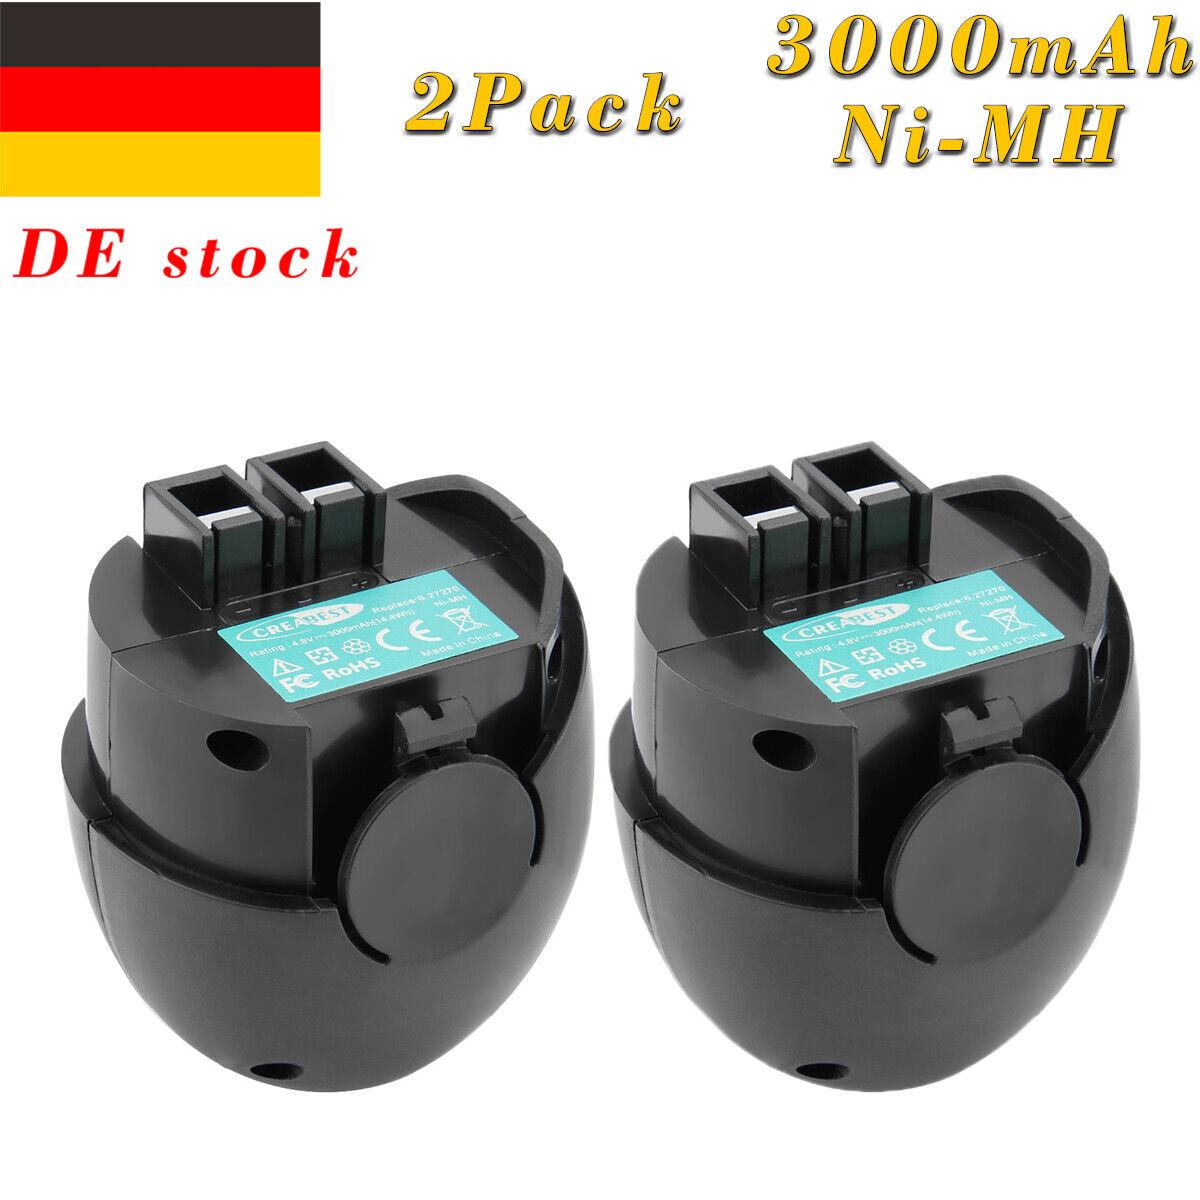 60005952 631858000 Elektrowerkzeug Akku für Metabo 2.1 Ah